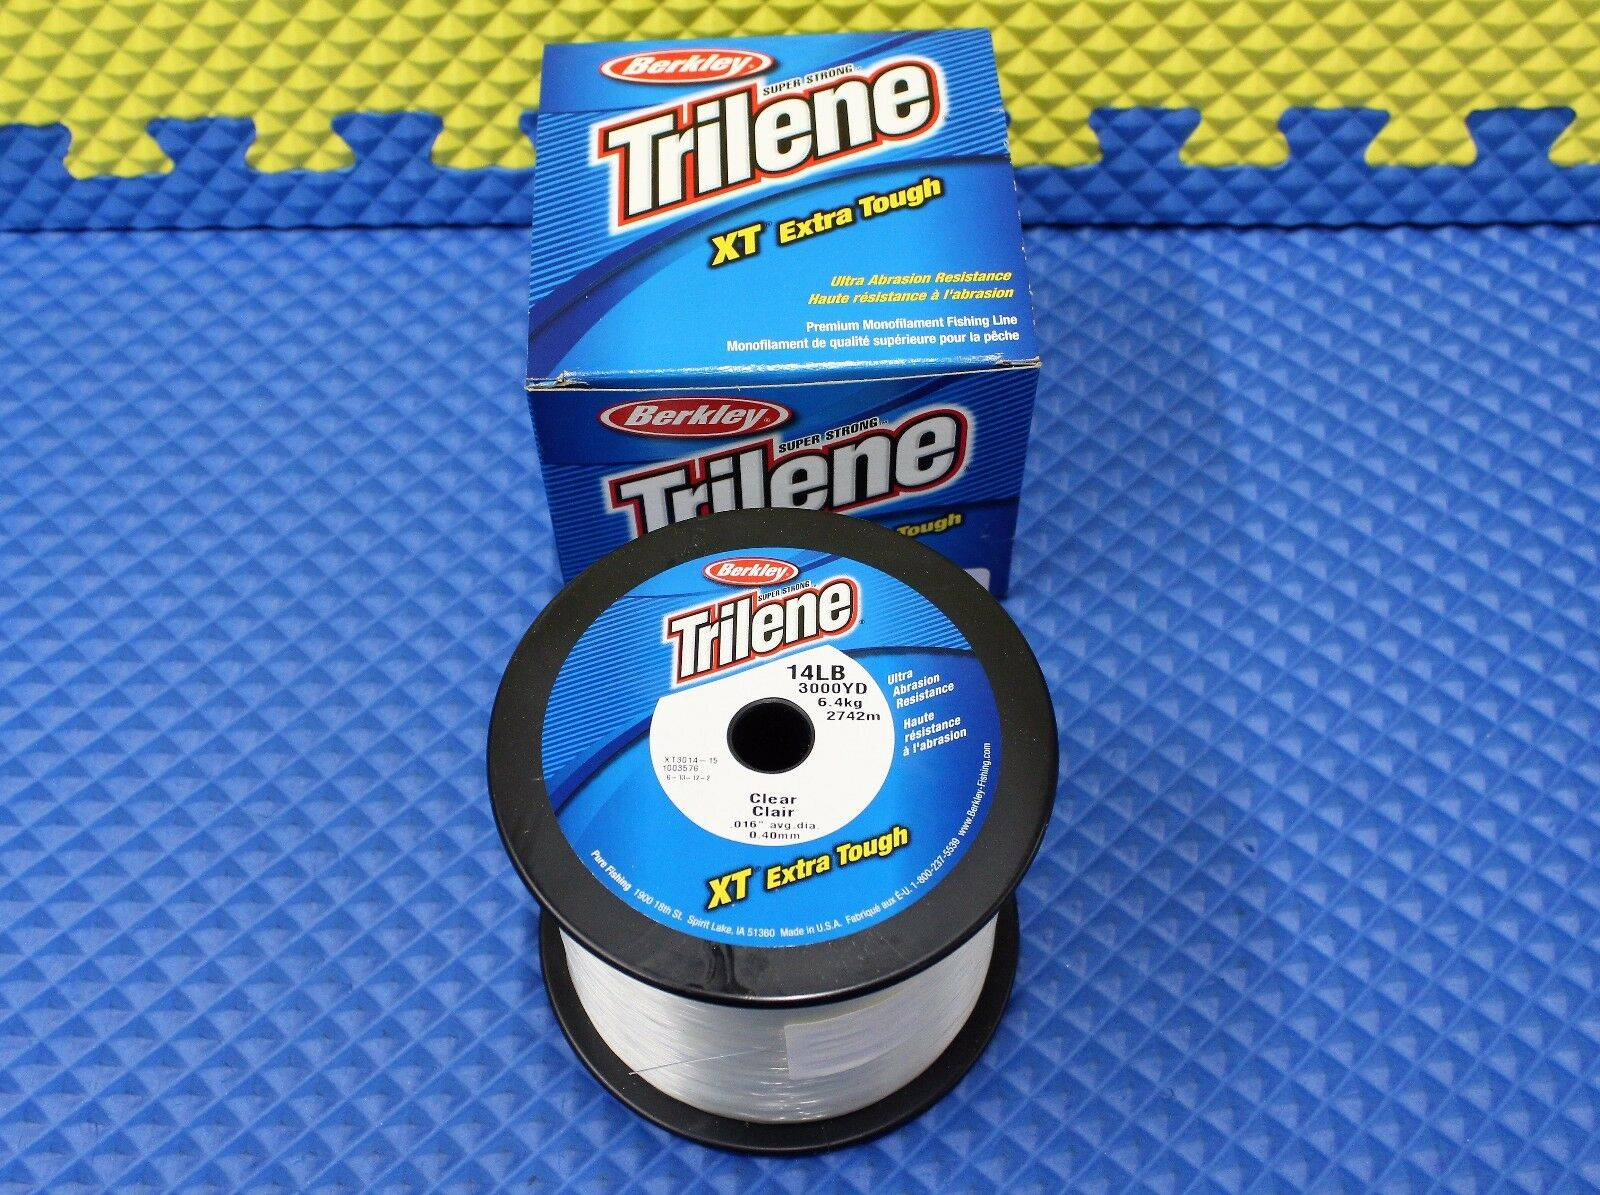 Berkley Trilene Xt Extra Tough 14 lb (environ 6.35 kg) 3000 Yd (environ 2743.20 m) Ligne De Pêche Clair XT3014-15